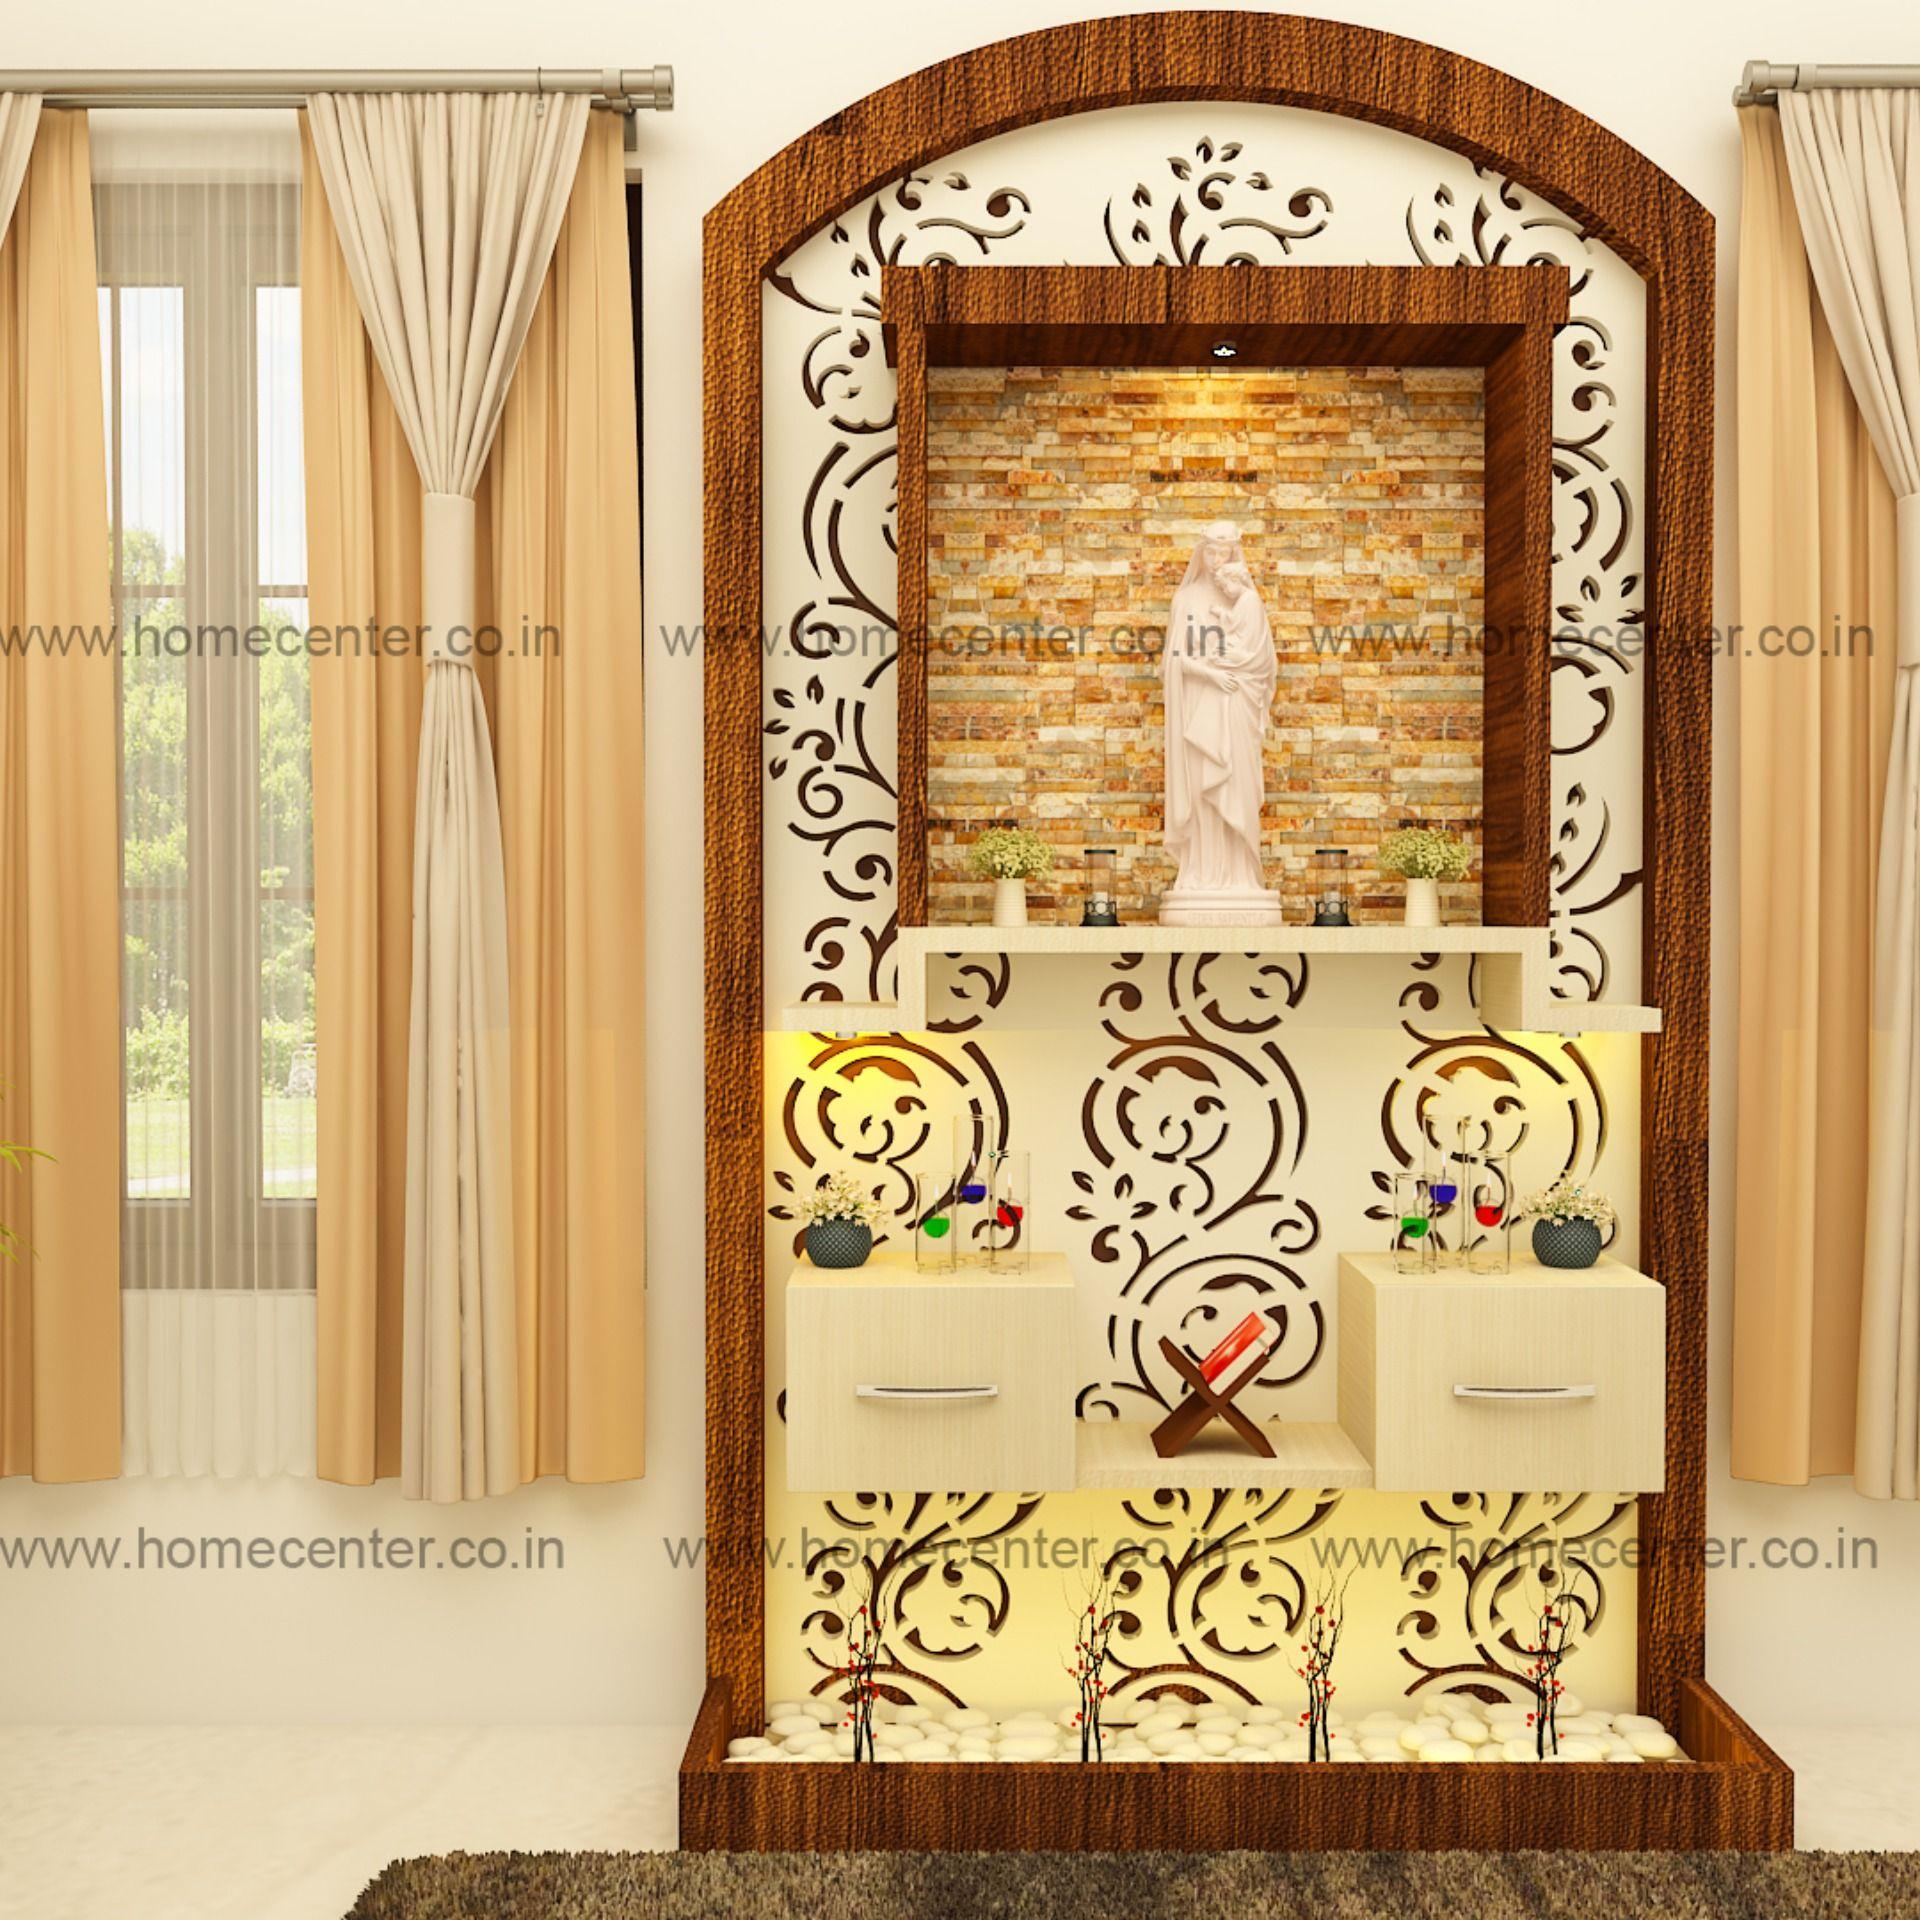 Interior Designers In Kottayam Home Center Interiors Interior Designers Design Interior Design Companies